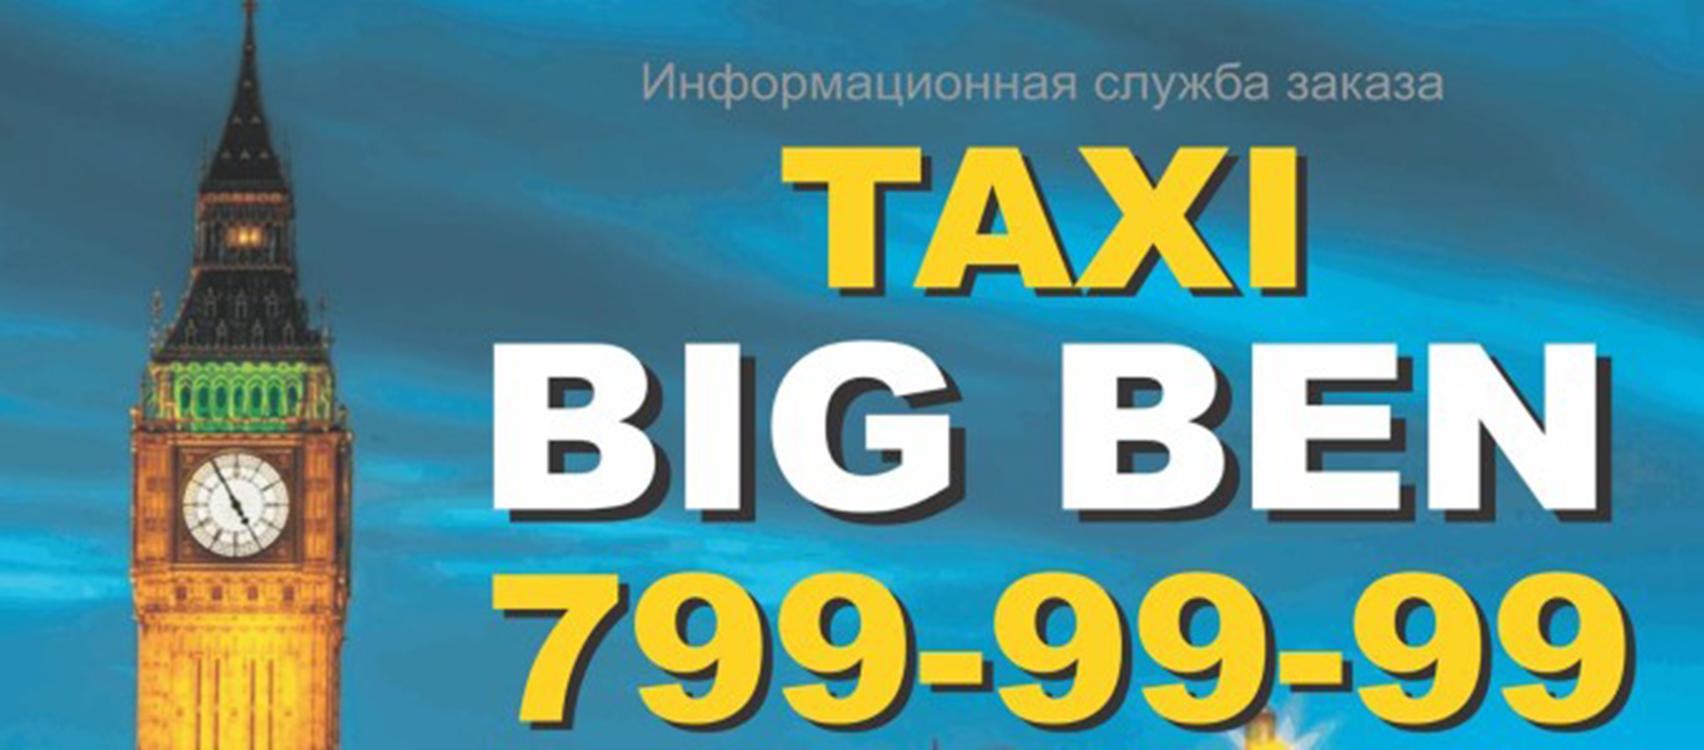 Таксі BIG BEN (Одеса)